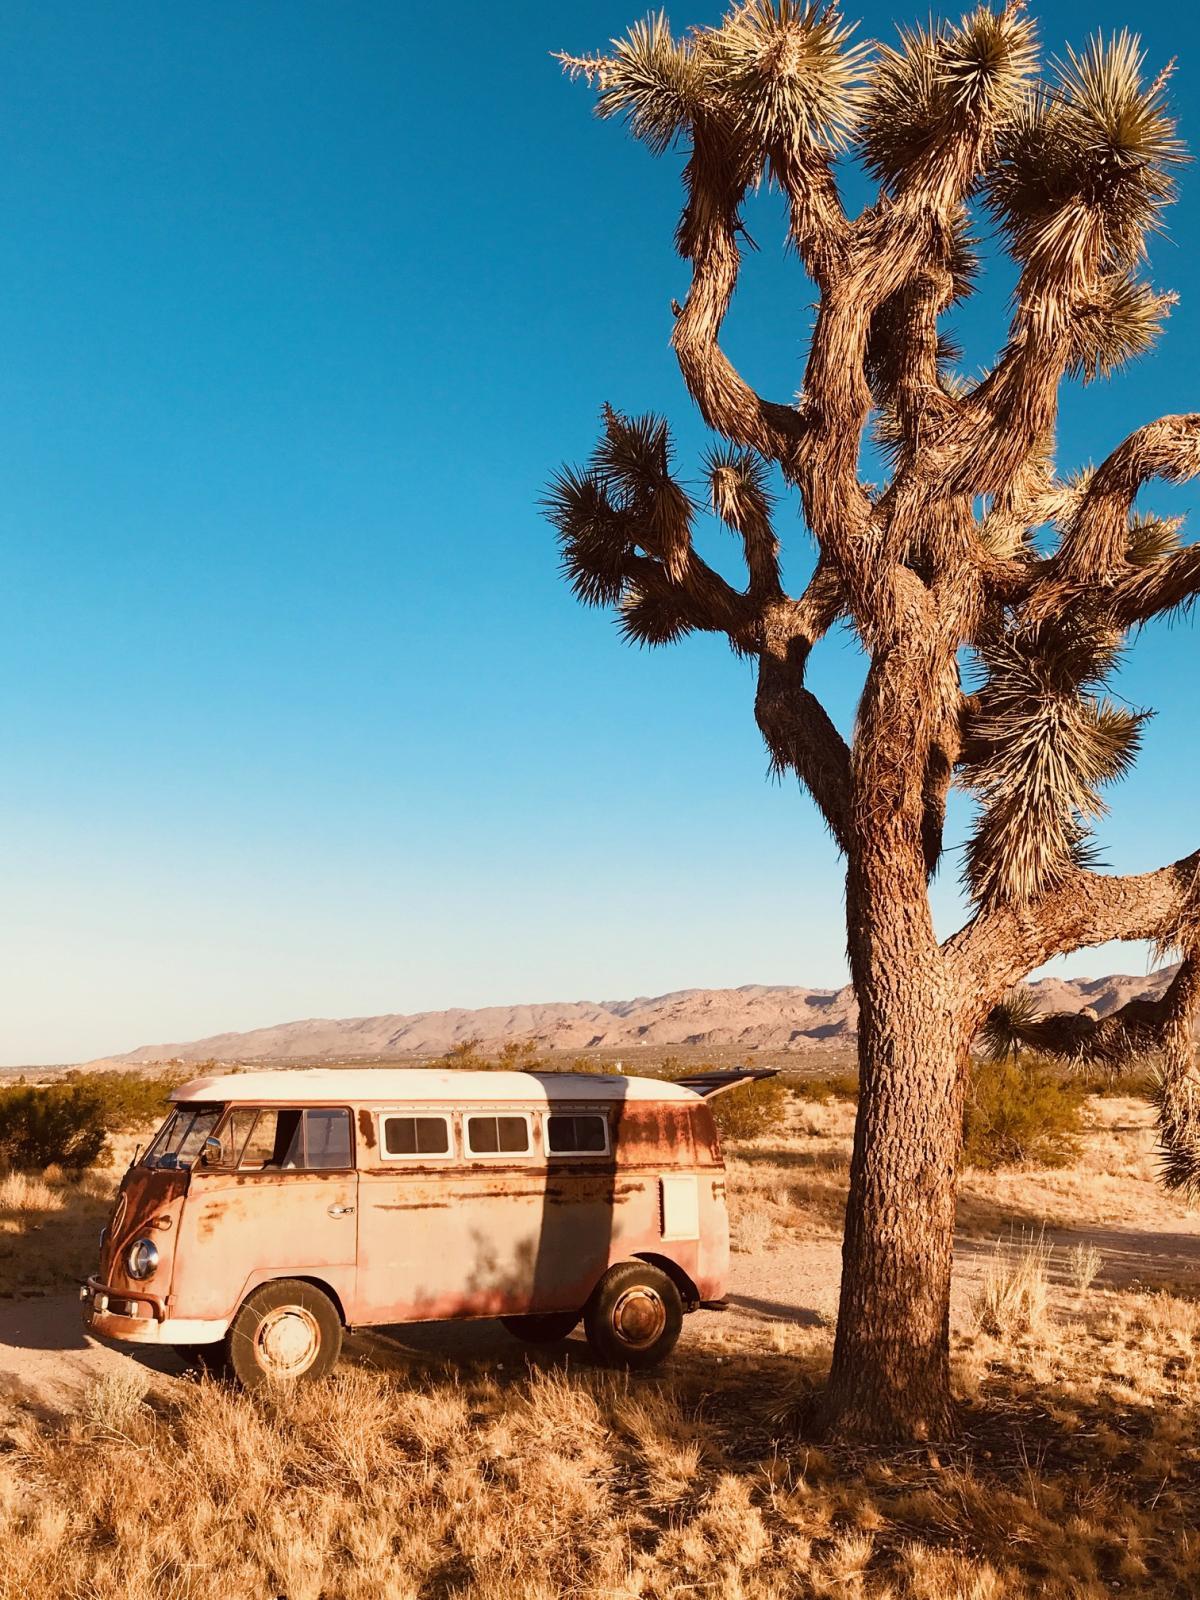 1960 Desert Bus Walkthrough WT Panel SWR Original Paint Joshua Tree California Off Road Dirt Type 4 Big Nut Golden Hour Solitude Summer